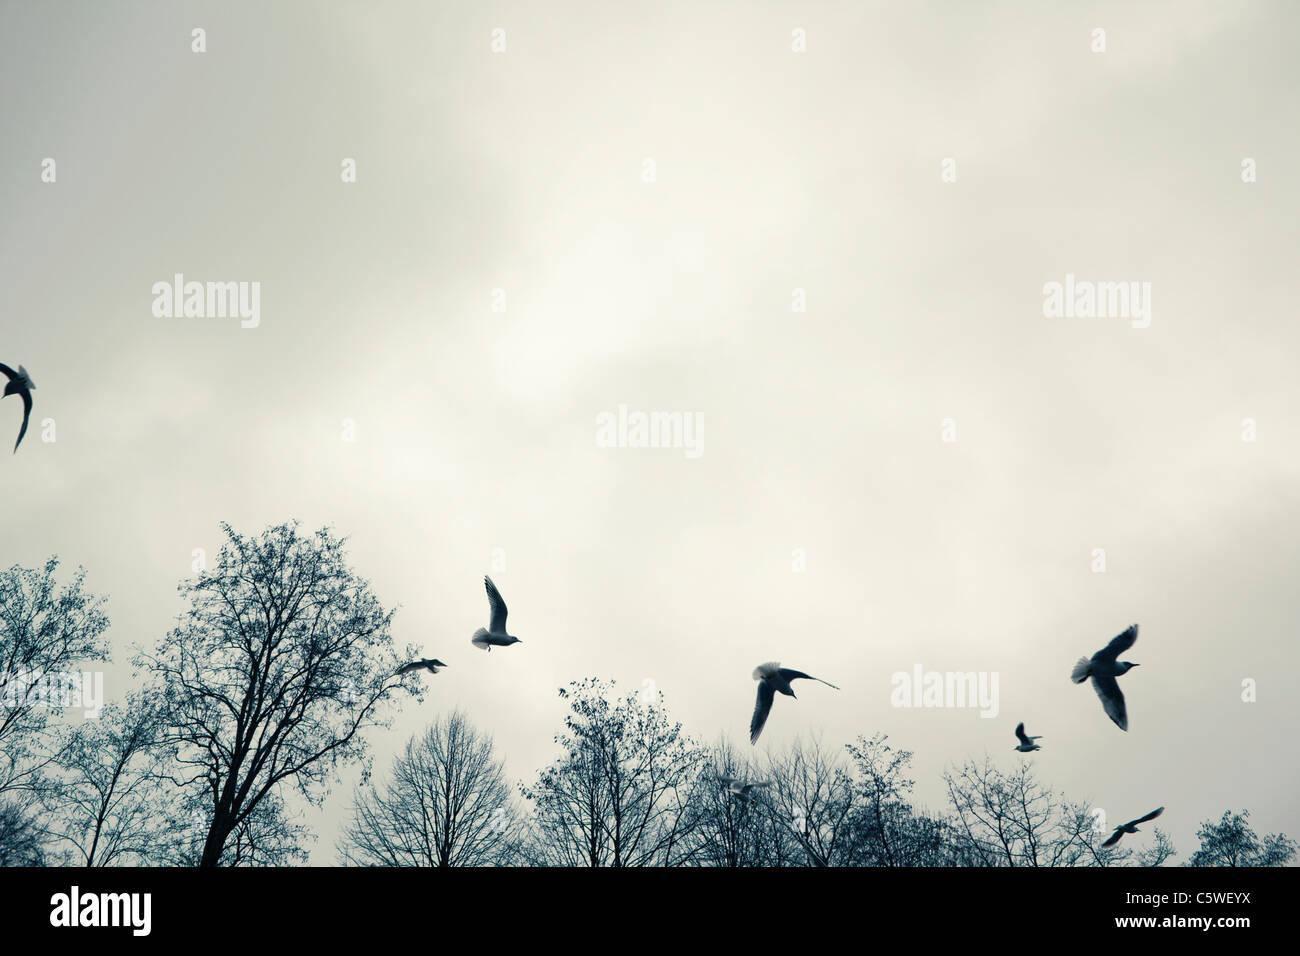 Germany, Hamburg, Seagulls in flight, low angle view - Stock Image